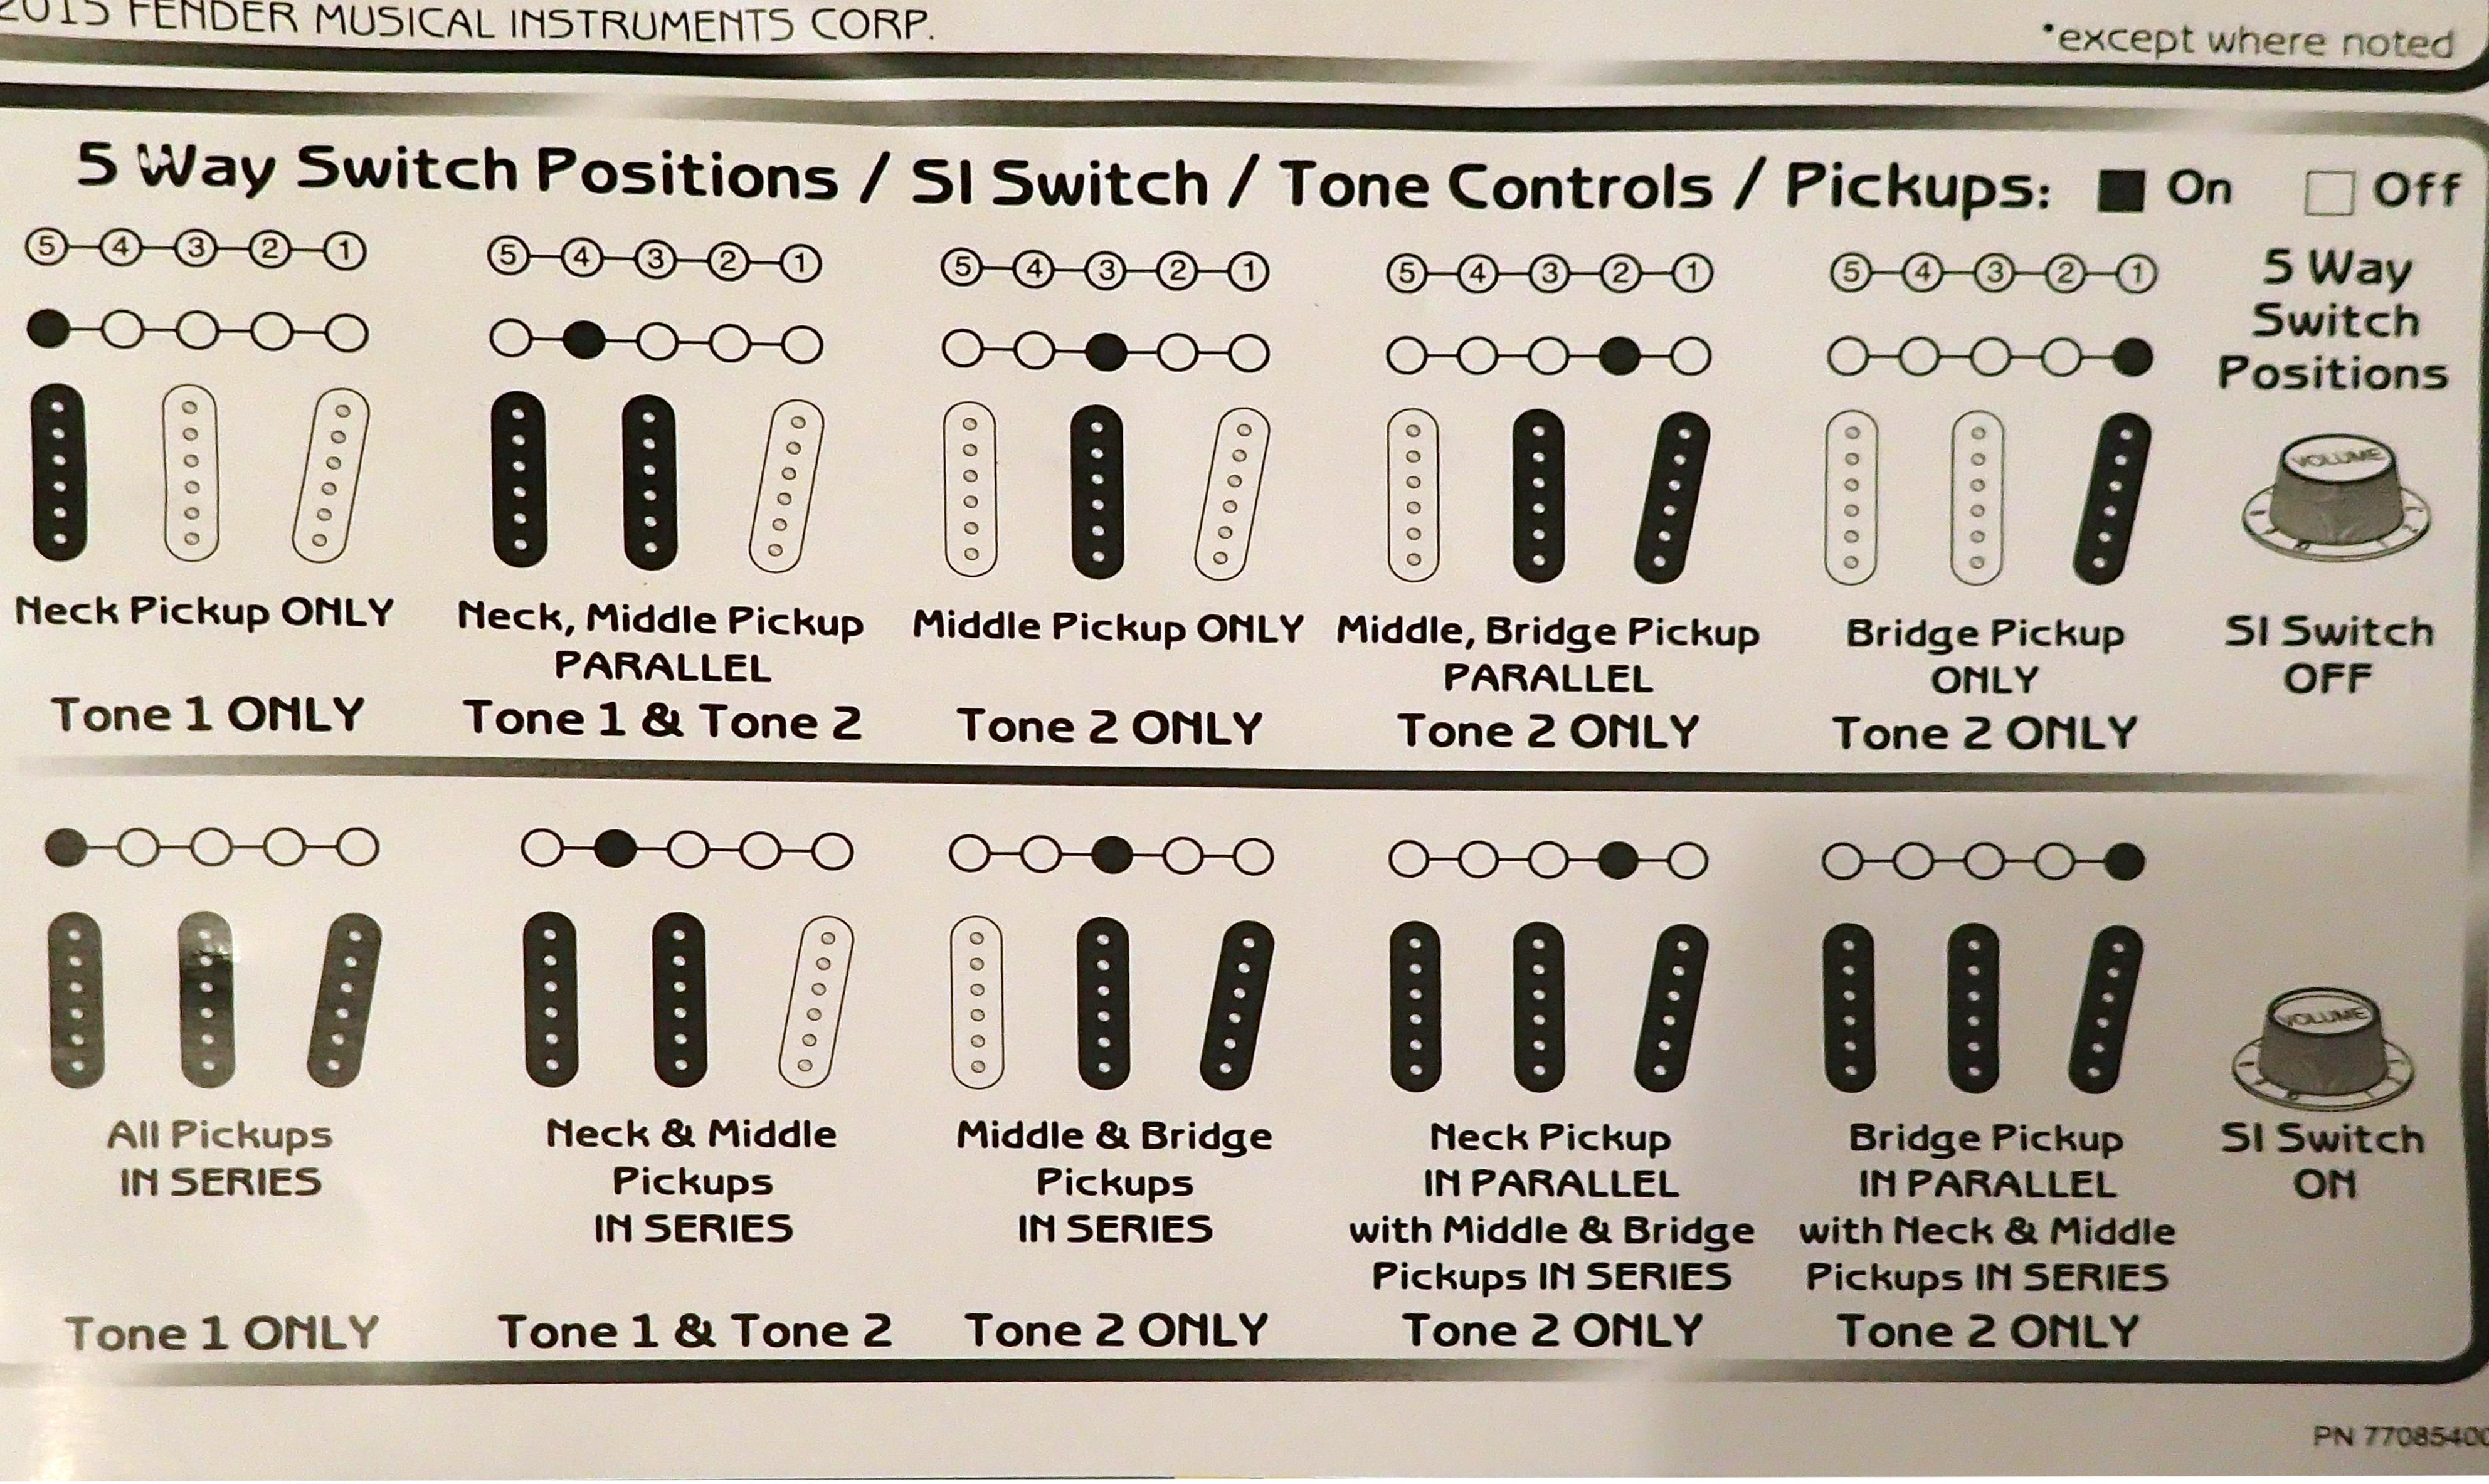 Pleasing Fender Elite Stratocaster Close Up Review Tonymckenzie Com Wiring Cloud Icalpermsplehendilmohammedshrineorg